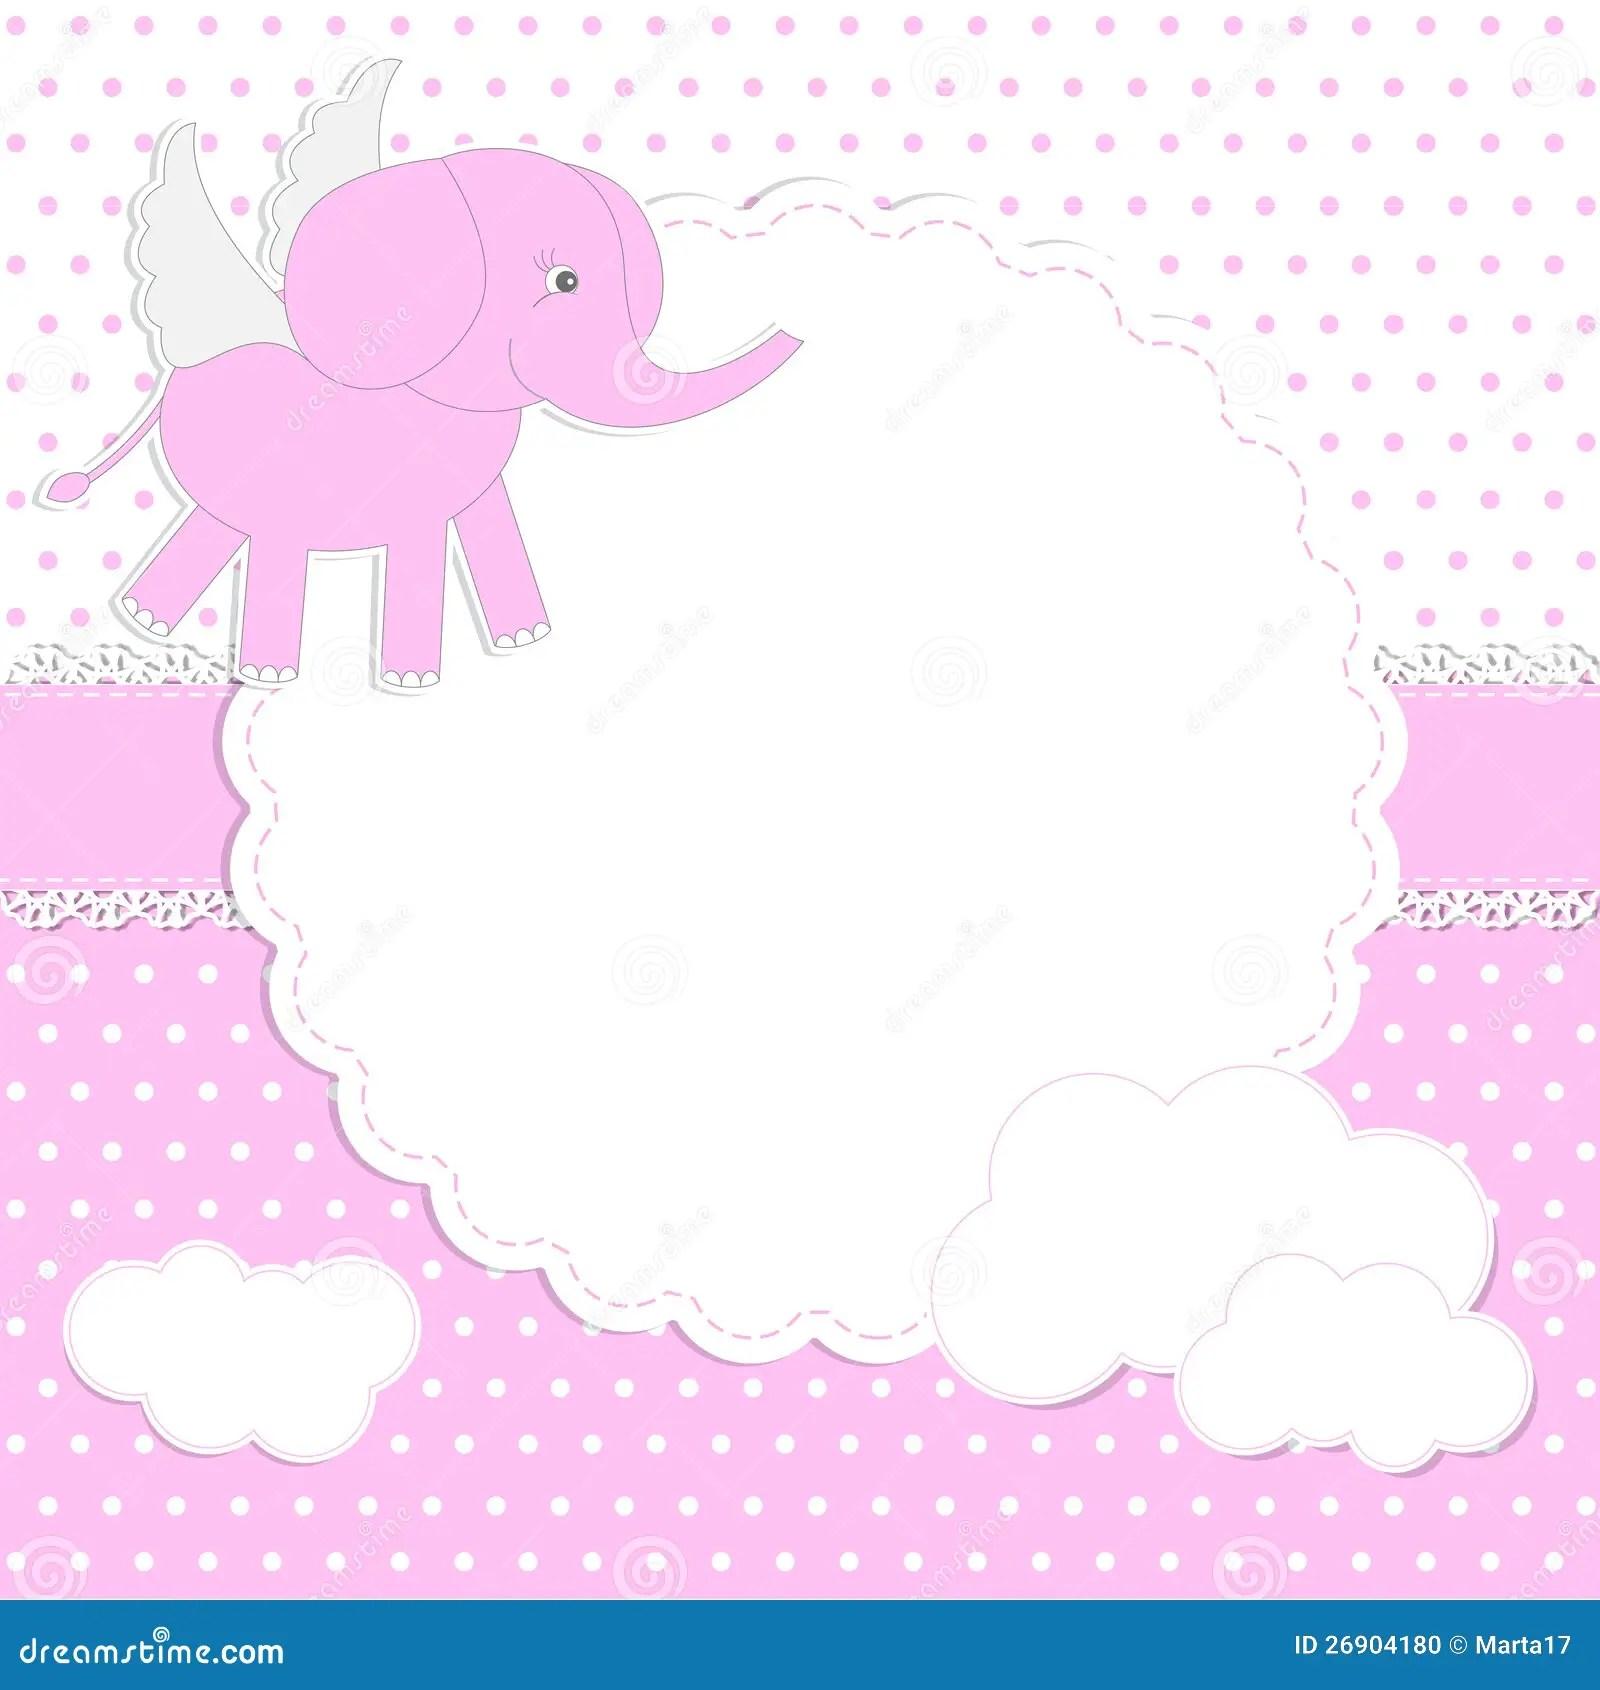 Cute Newborn Baby Girl Wallpaper Cute Baby Girl Card Stock Vector Illustration Of Cloud